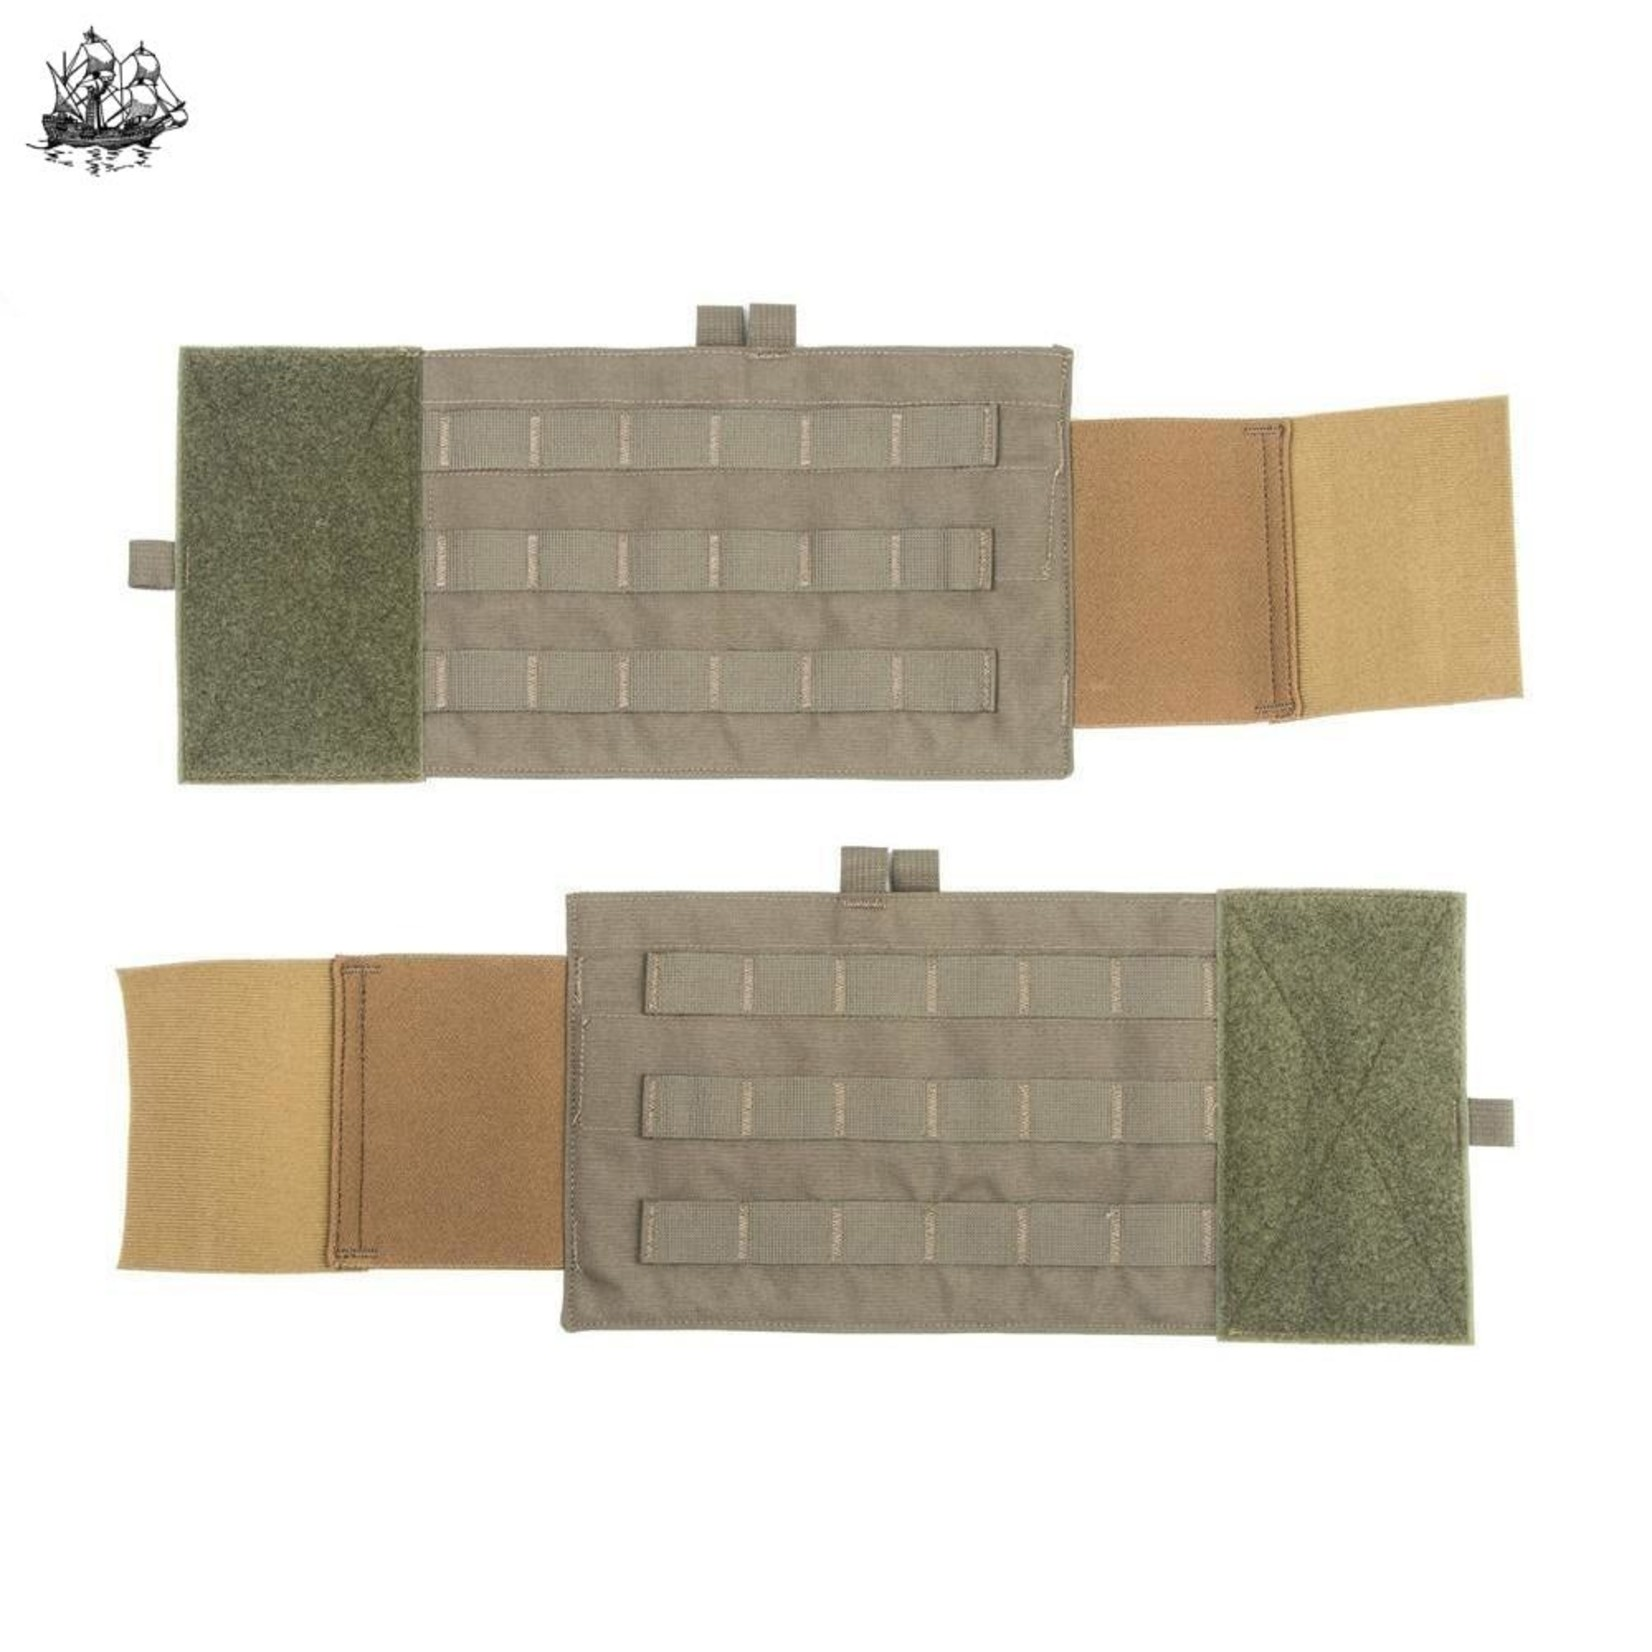 MAYFLOWER-RC STANDARD MOLLE, PLATE POCKET CUMMERBUND